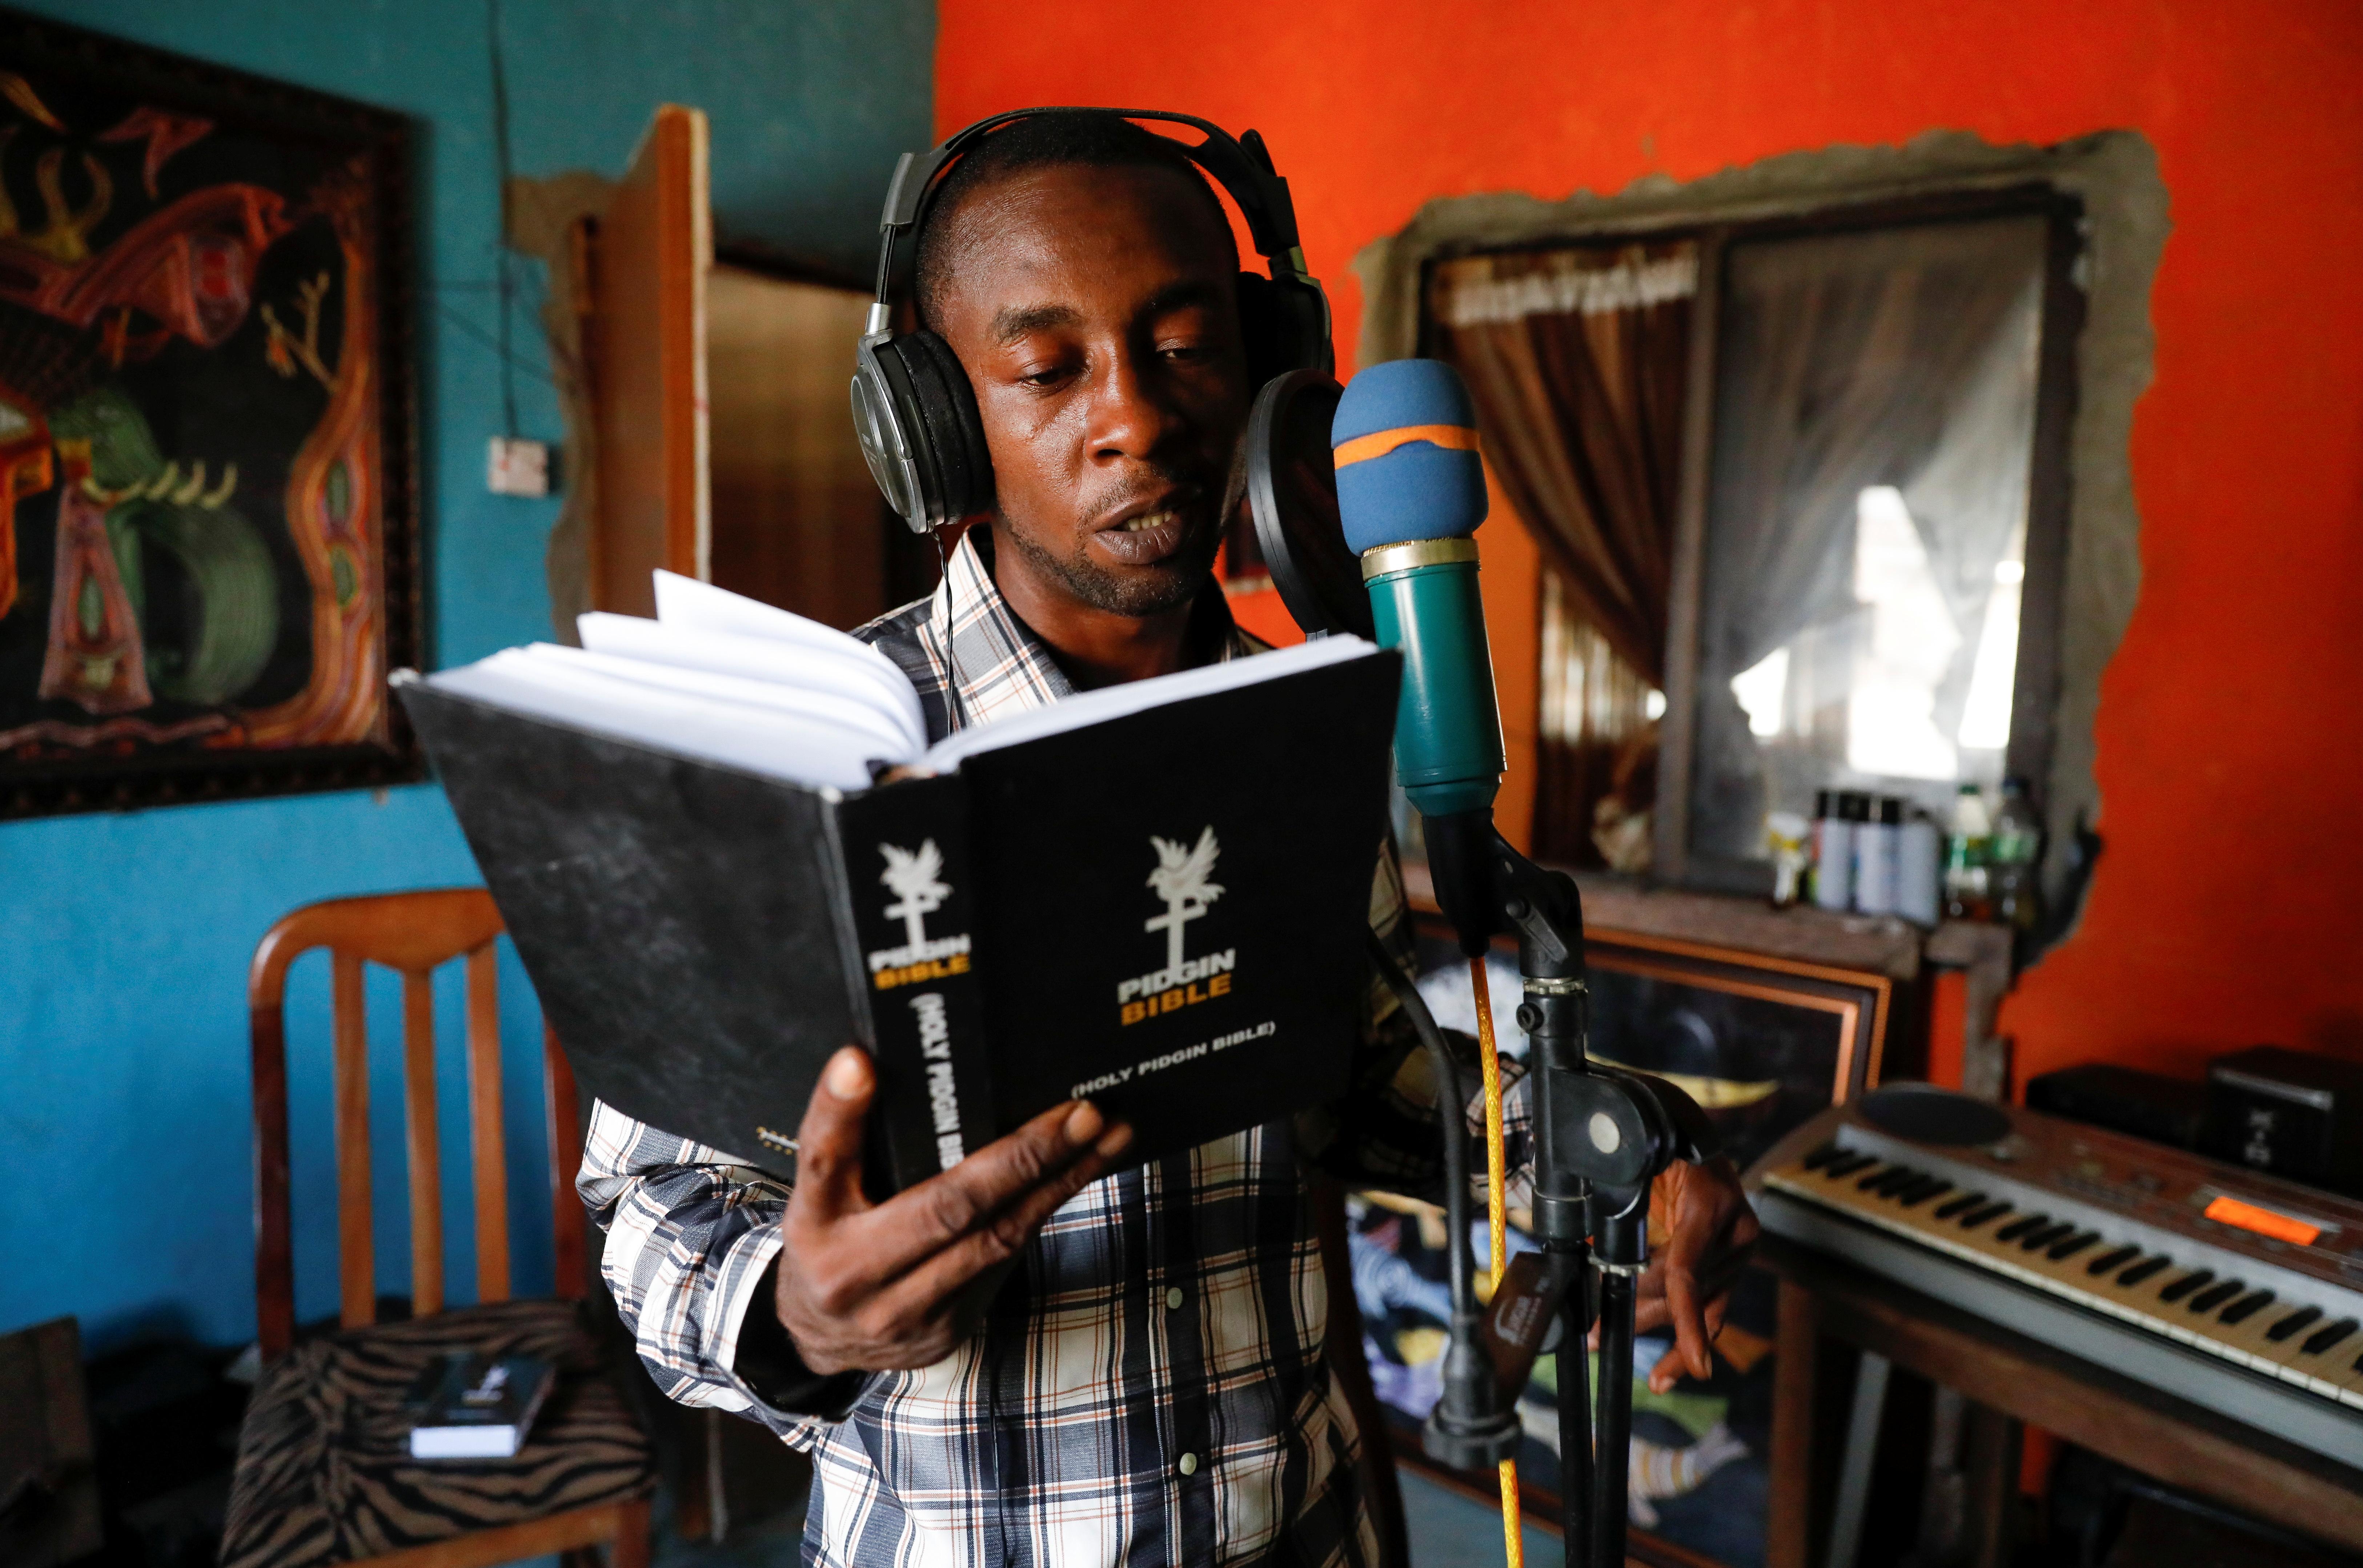 Salem Egoh, translator of the Bible into Nigerian Pidgin, reads as he records the audio version at his studio in Lekki, Lagos, Nigeria June 25, 2021. REUTERS/Temilade Adelaja